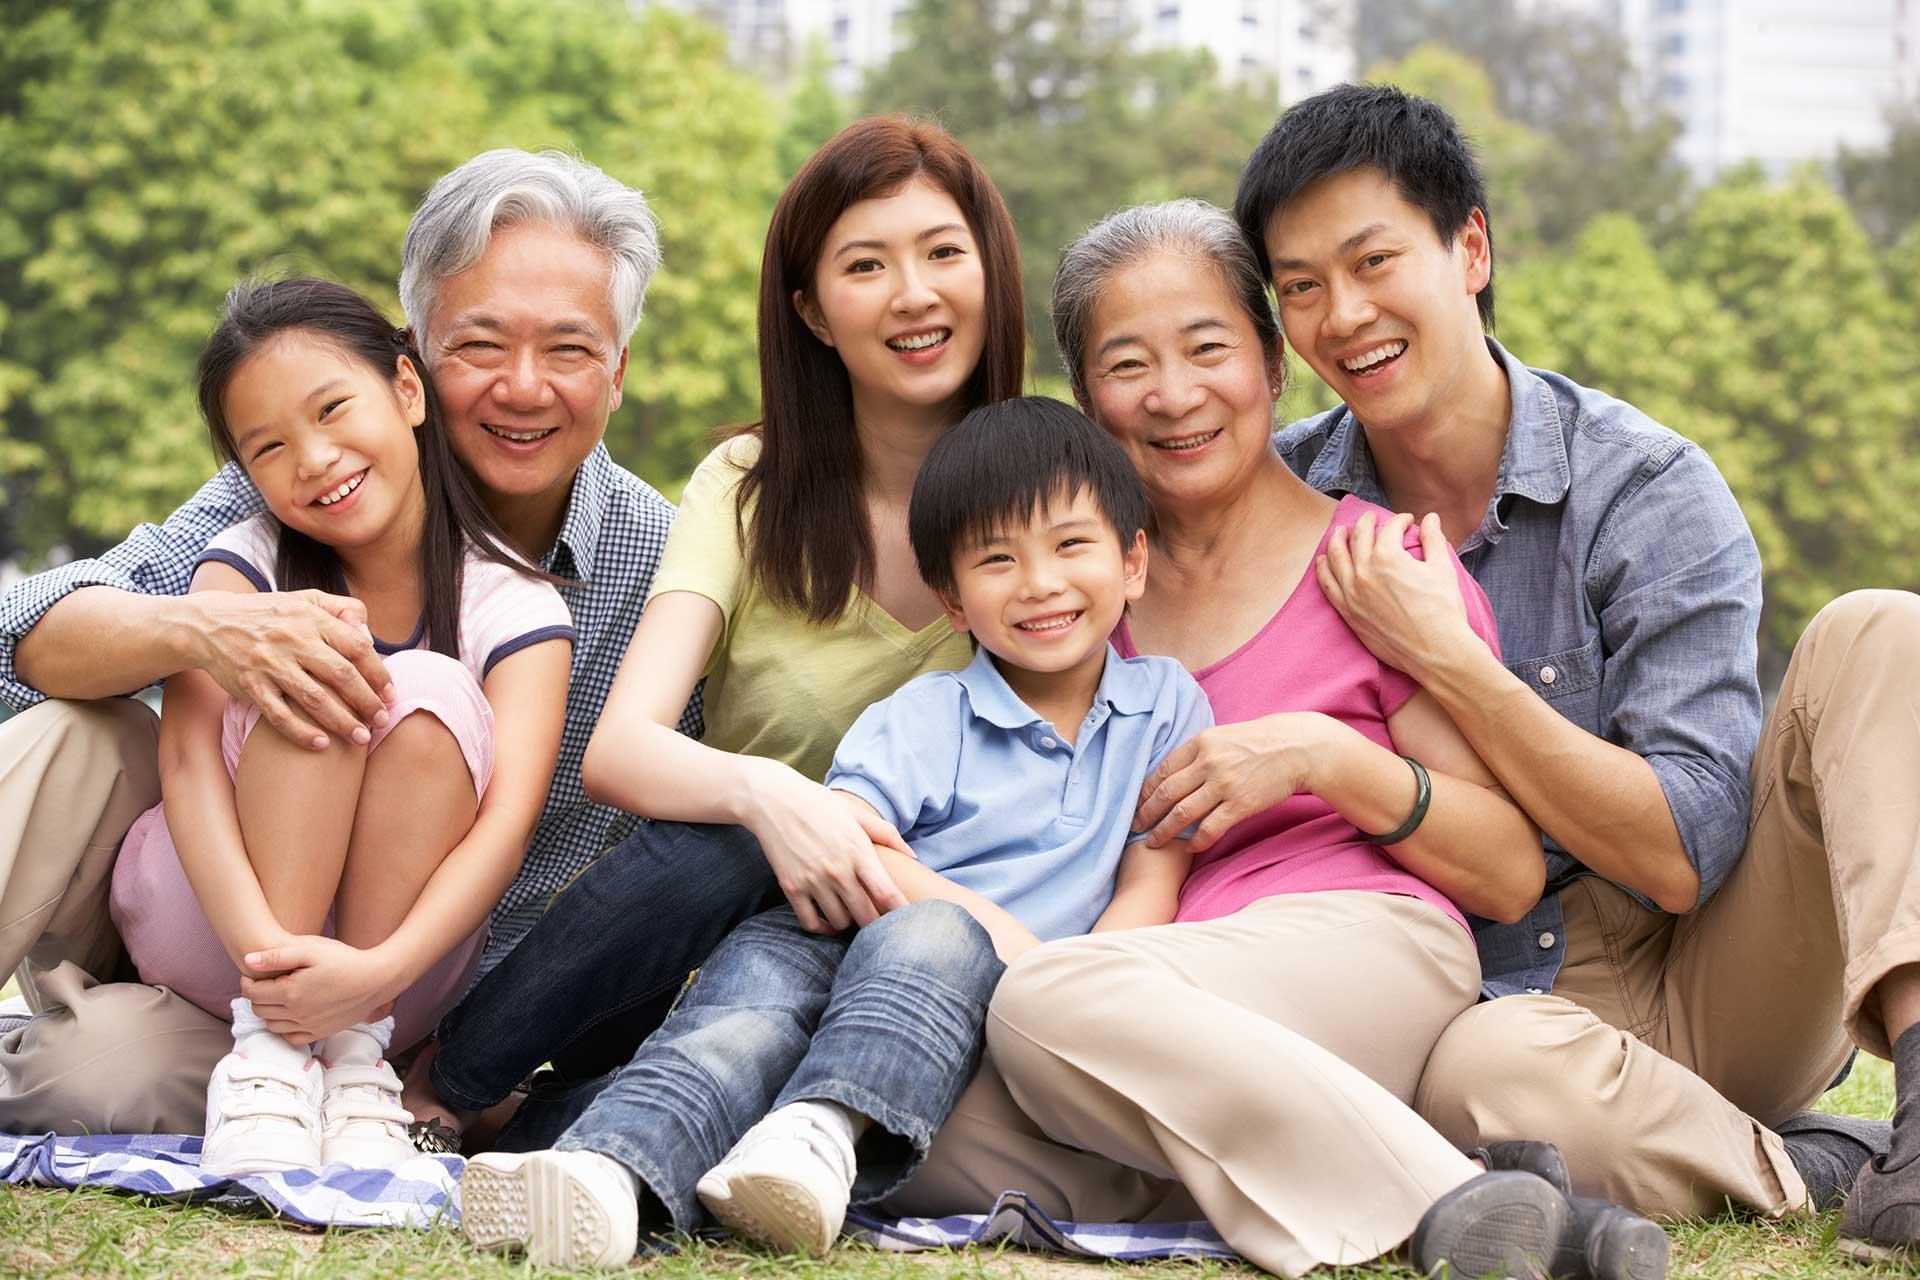 A large family enjoys their vacation after a dental visit at Princeton Park Dental